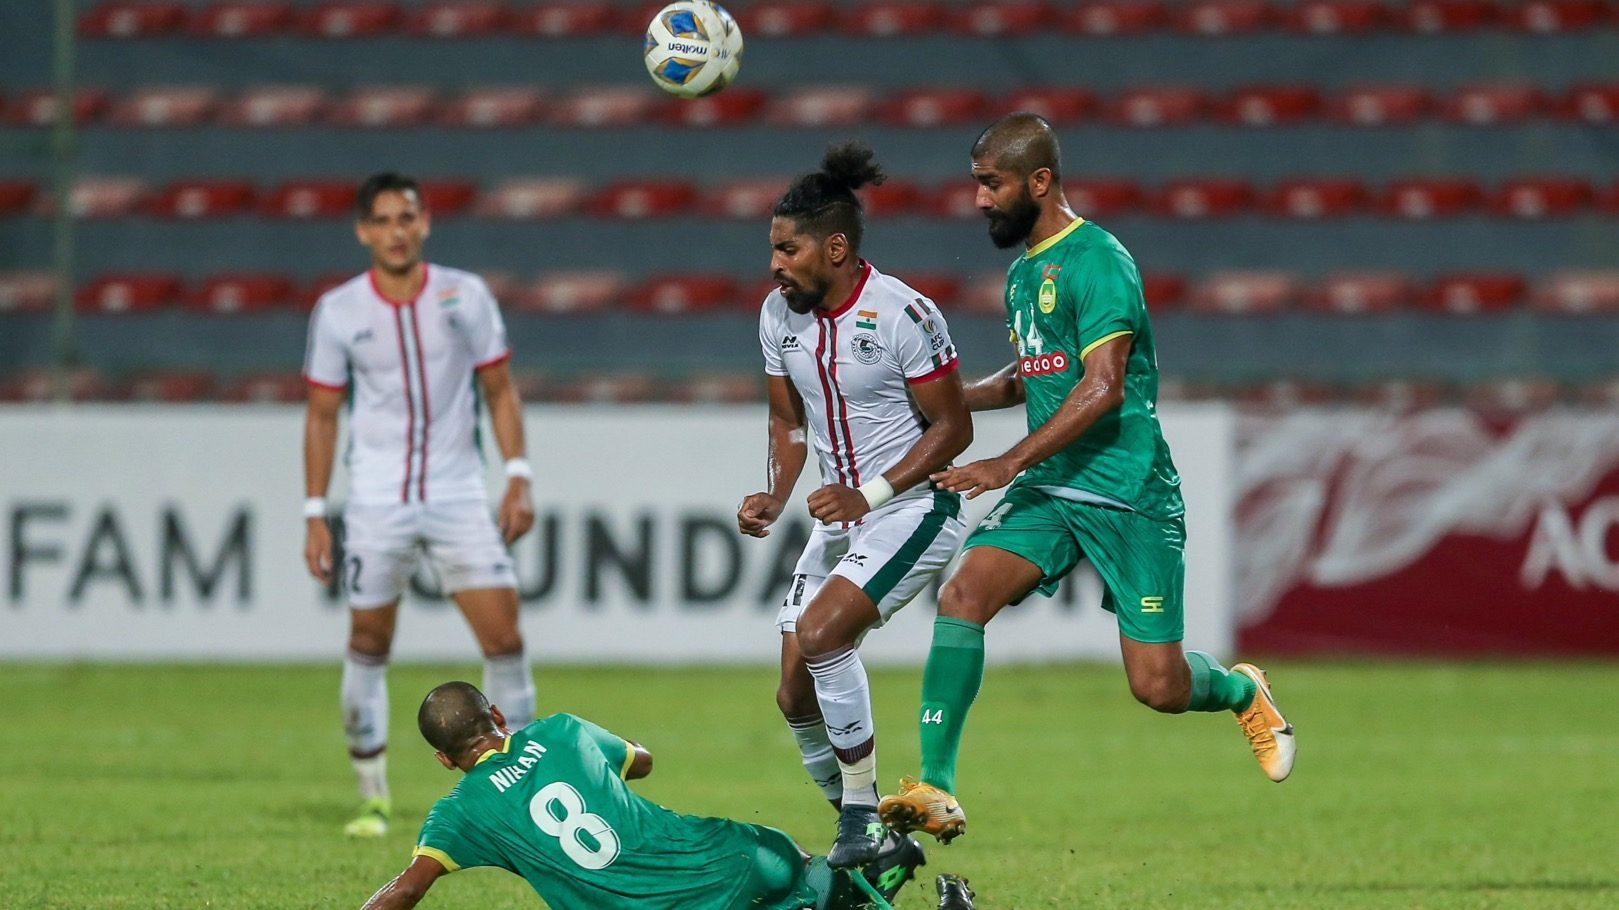 ATK Mohun Bagan vs Bashundhara Kings AFC Cup 2021: Get telecast and live streaming details